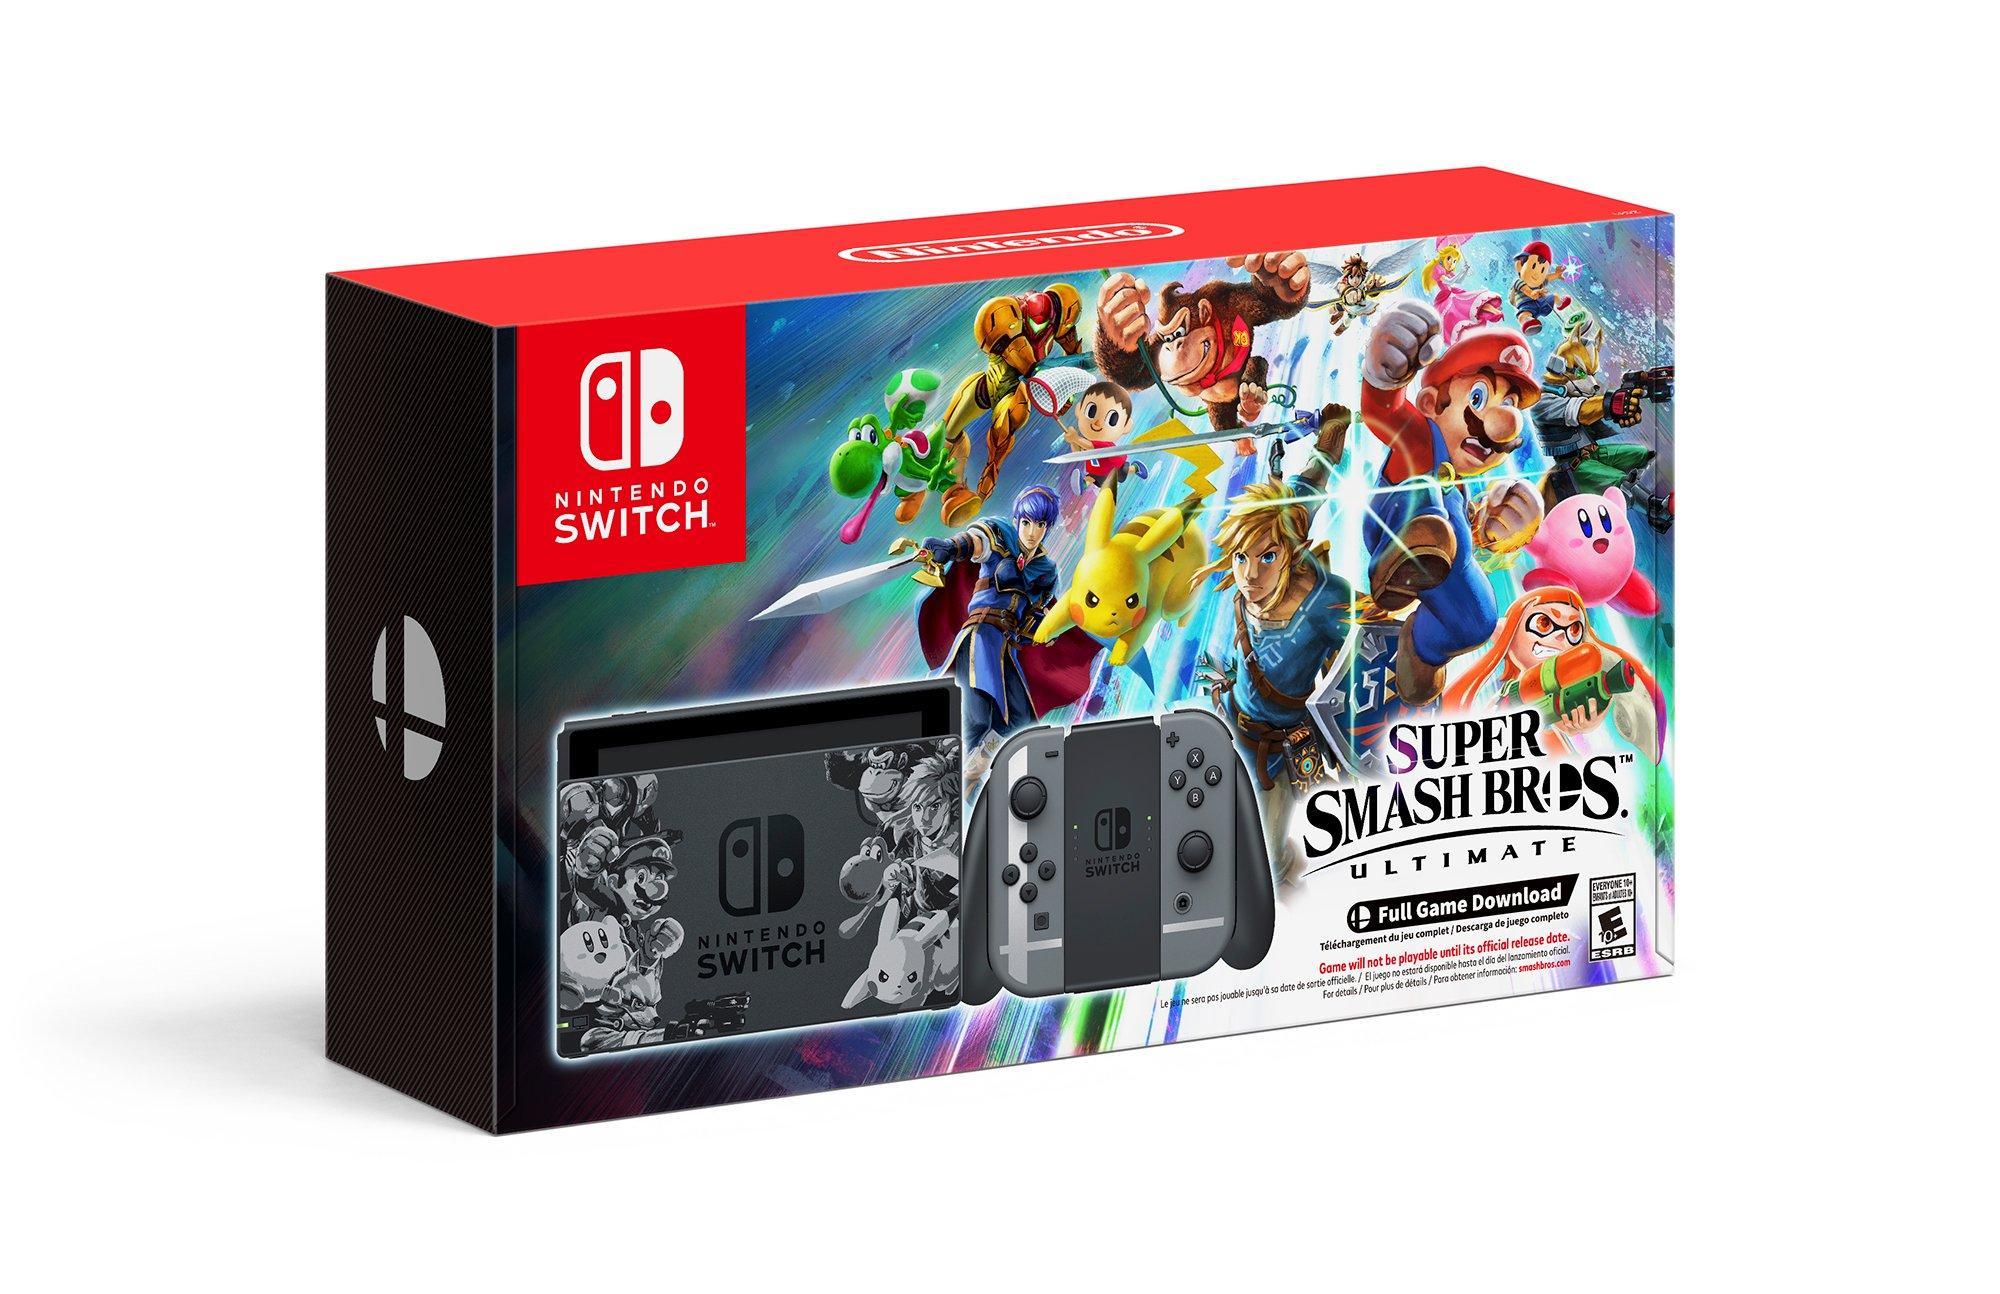 Nintendo Switch Super Smash Bros  Ultimate Edition Console   Nintendo  Switch   GameStop